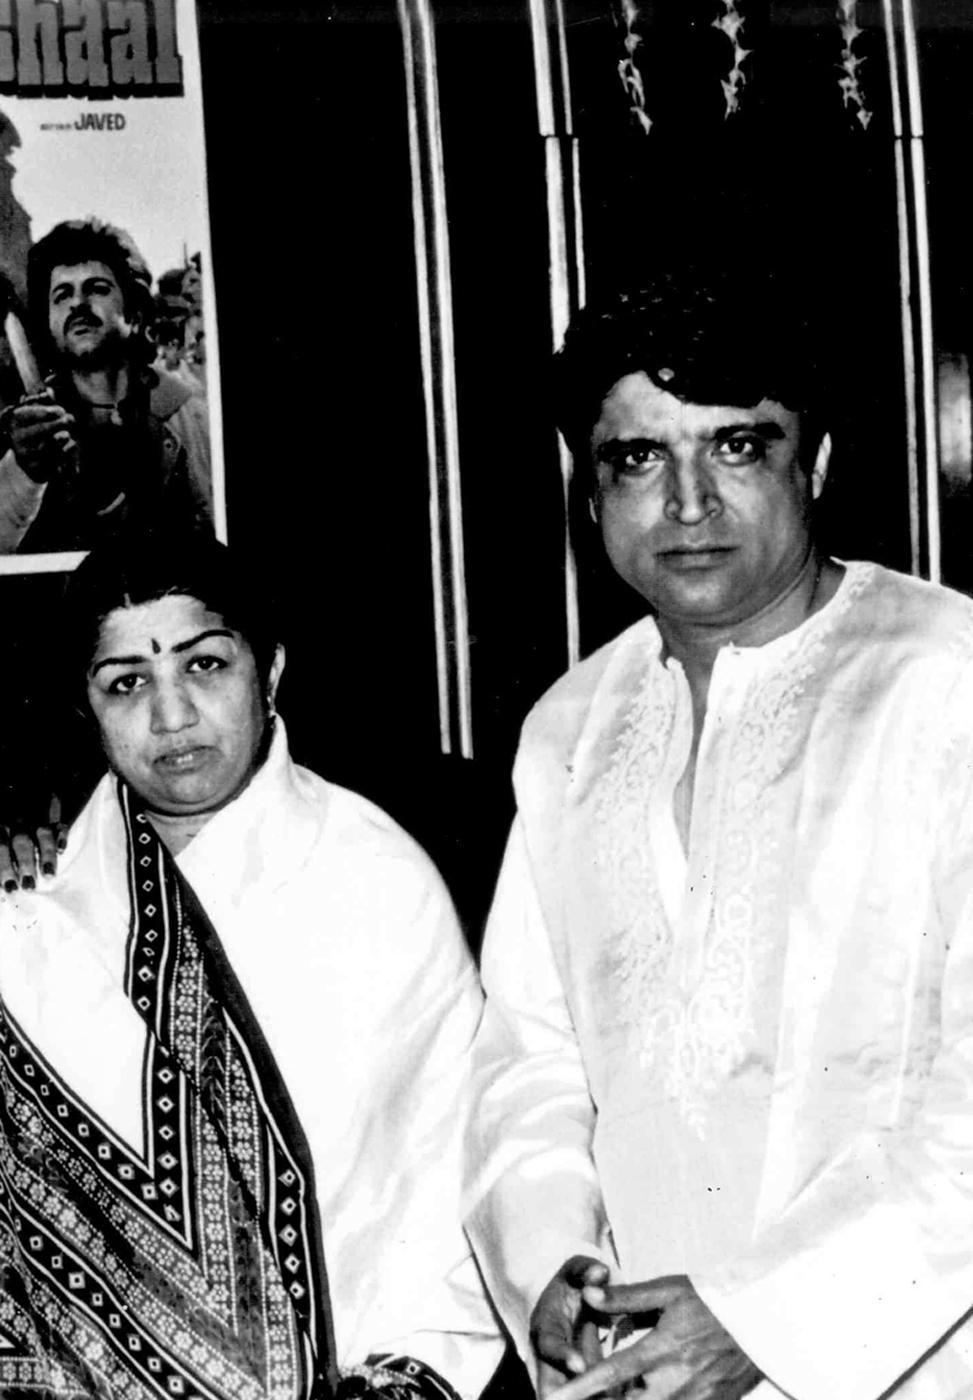 Javed Akhtar Lata Mangeshkar at the music launch of Mashaal